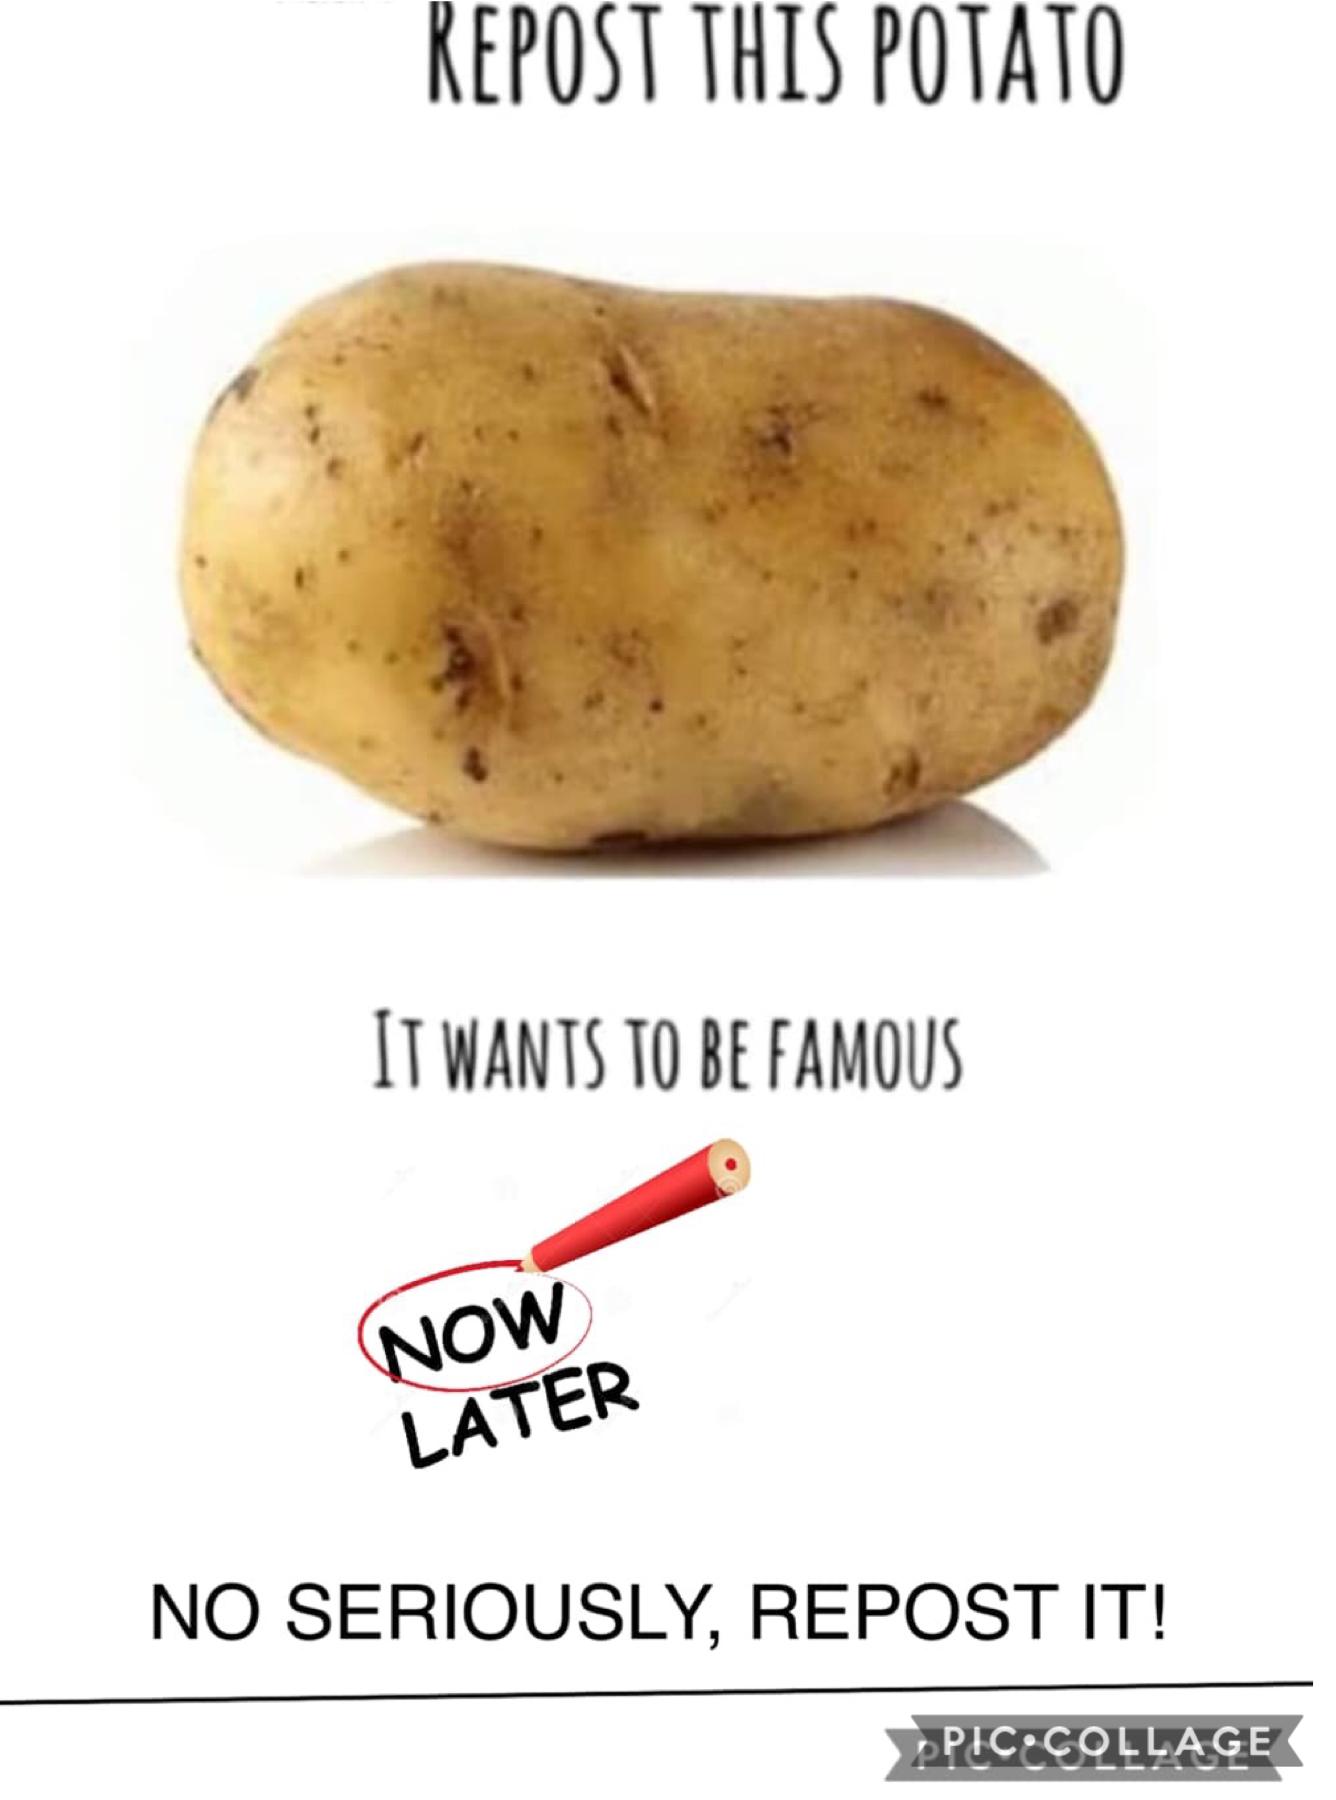 repost this potato pls! 🥔